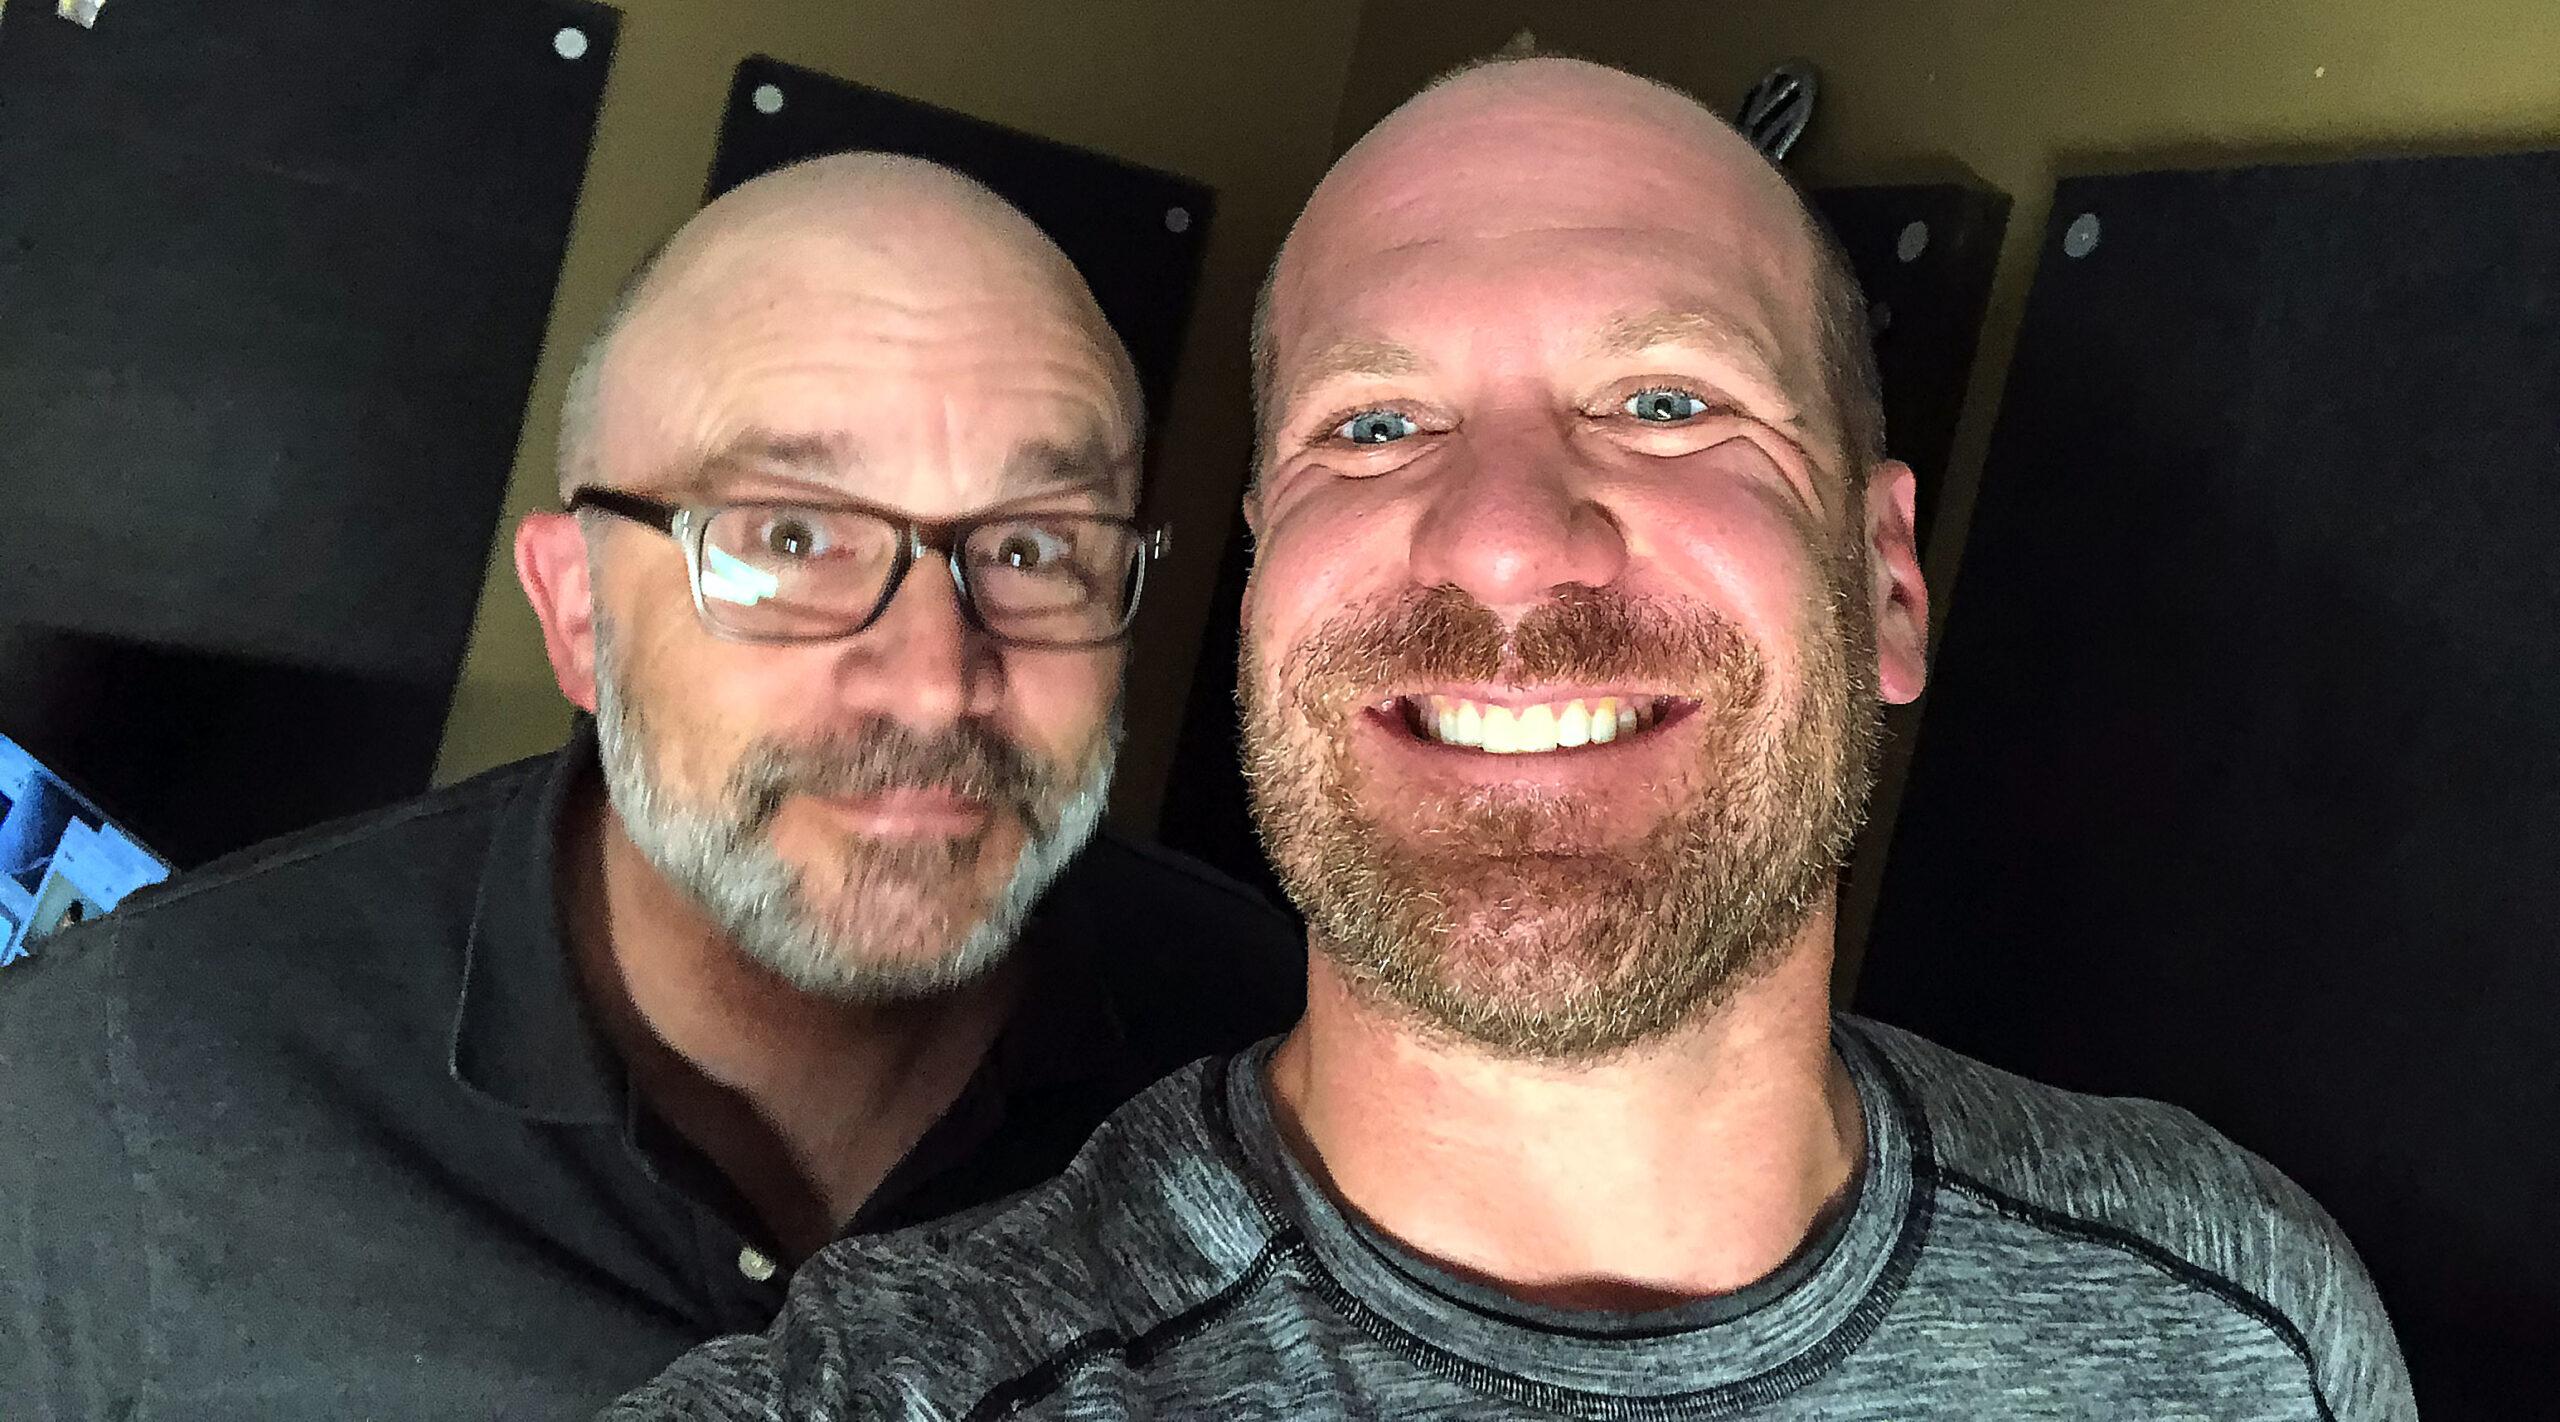 Cory (right) and Dan